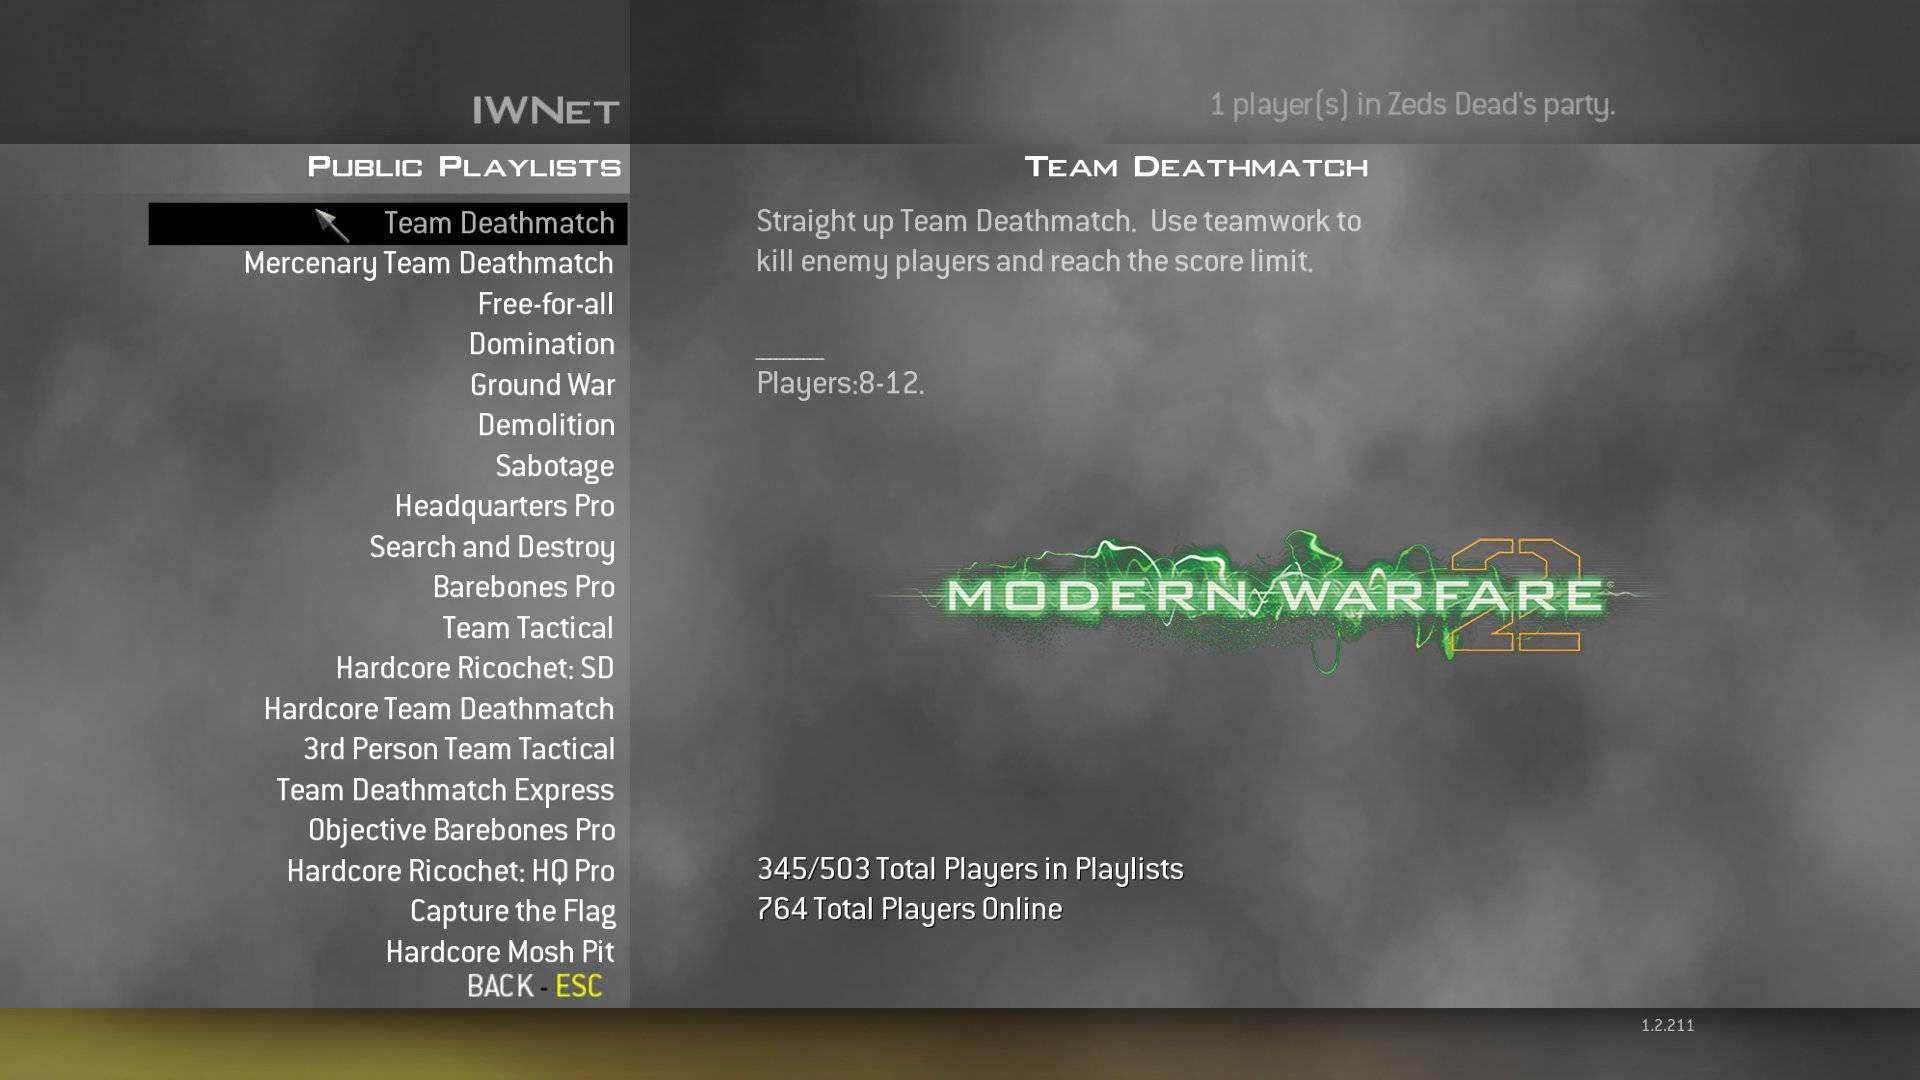 Modern Warfare 2 TDM Sunucu Bulma Sorunu